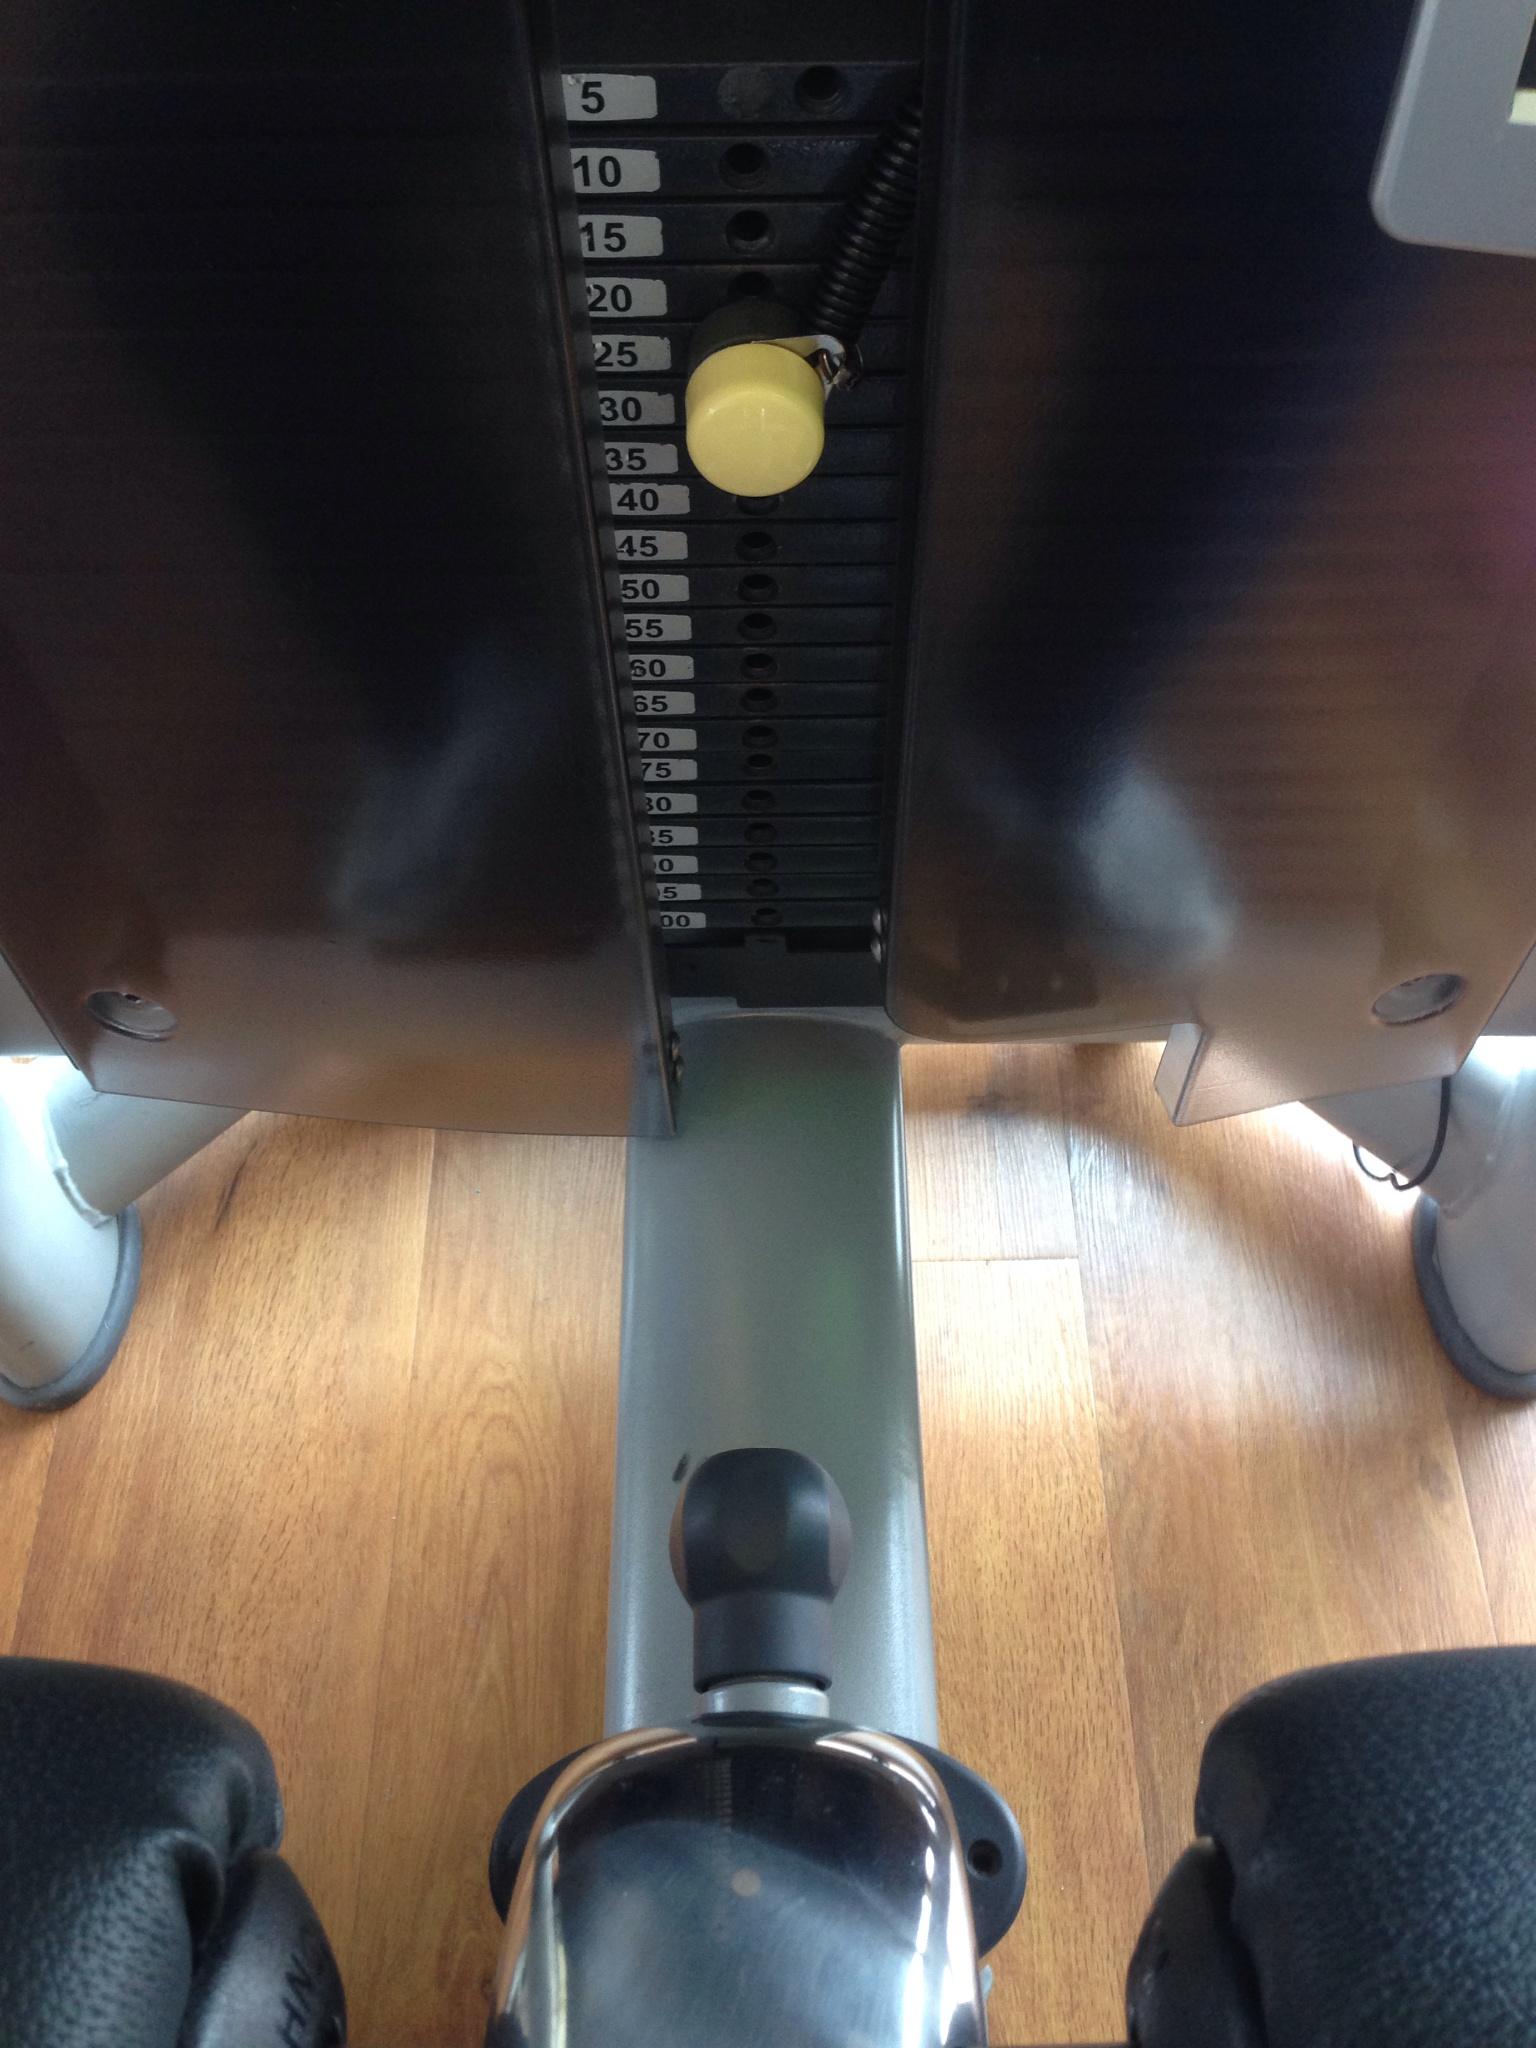 Gym when sick is great  by Robert Hopman